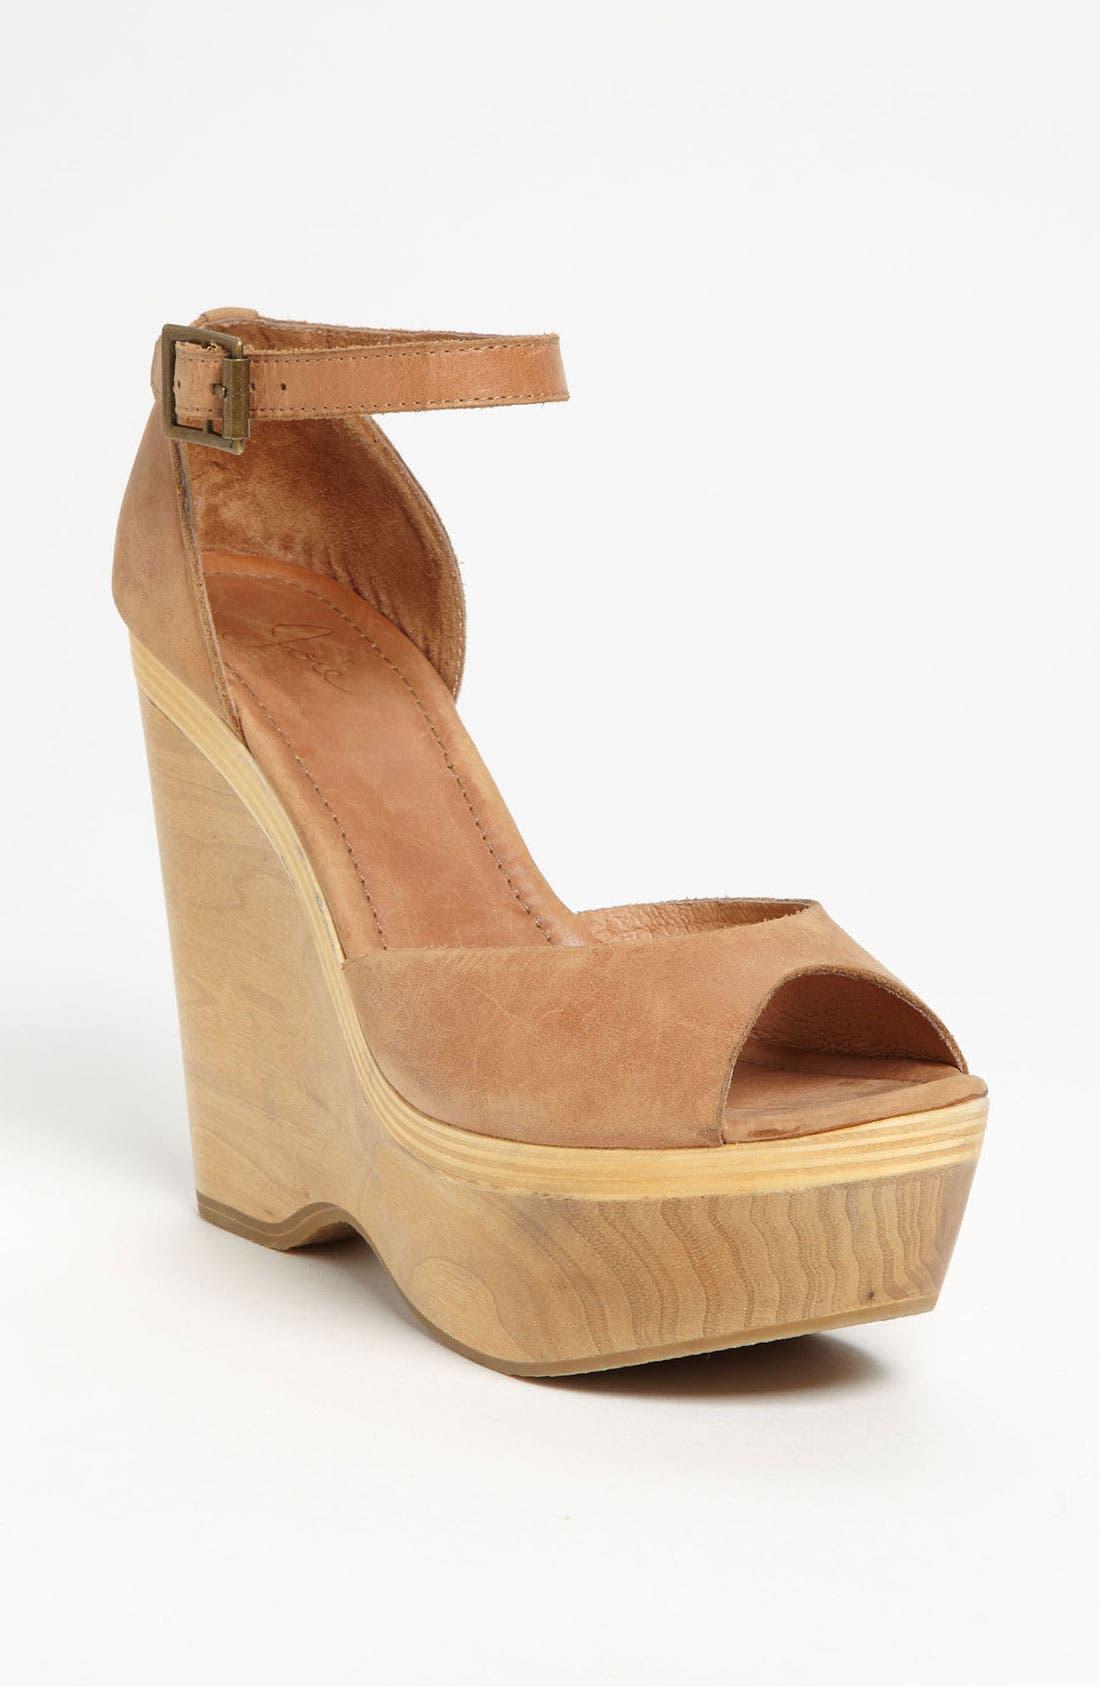 Main Image - Joie 'Blair' Wedge Sandal